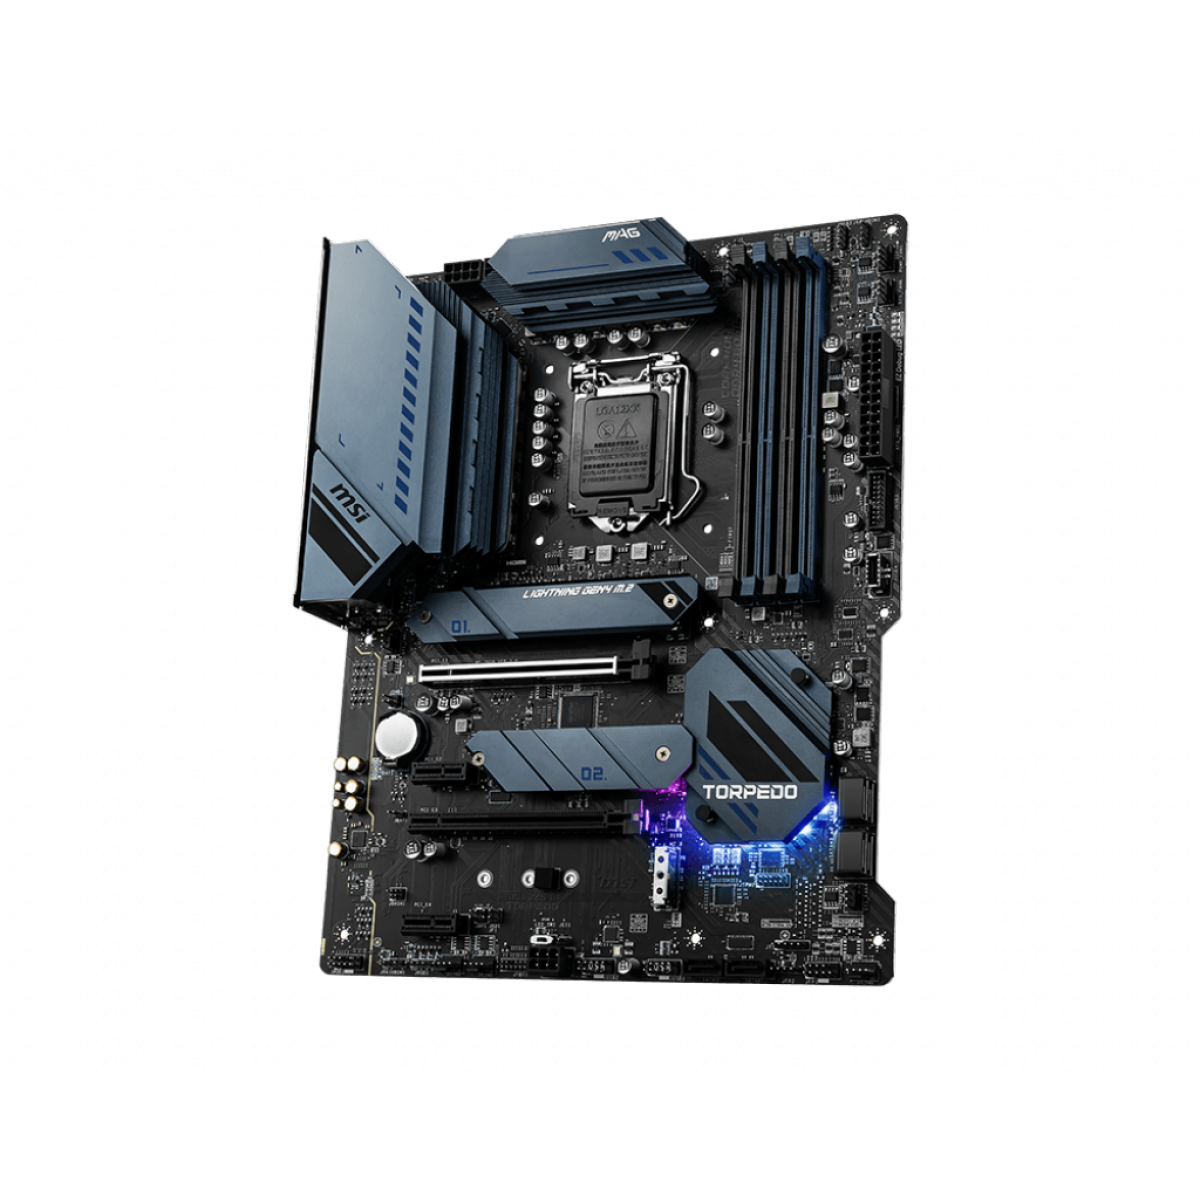 Placa Mãe MSI MAG Z590 TORPEDO, Chipset Intel Z590, Socket 1200, ATX, DDR4